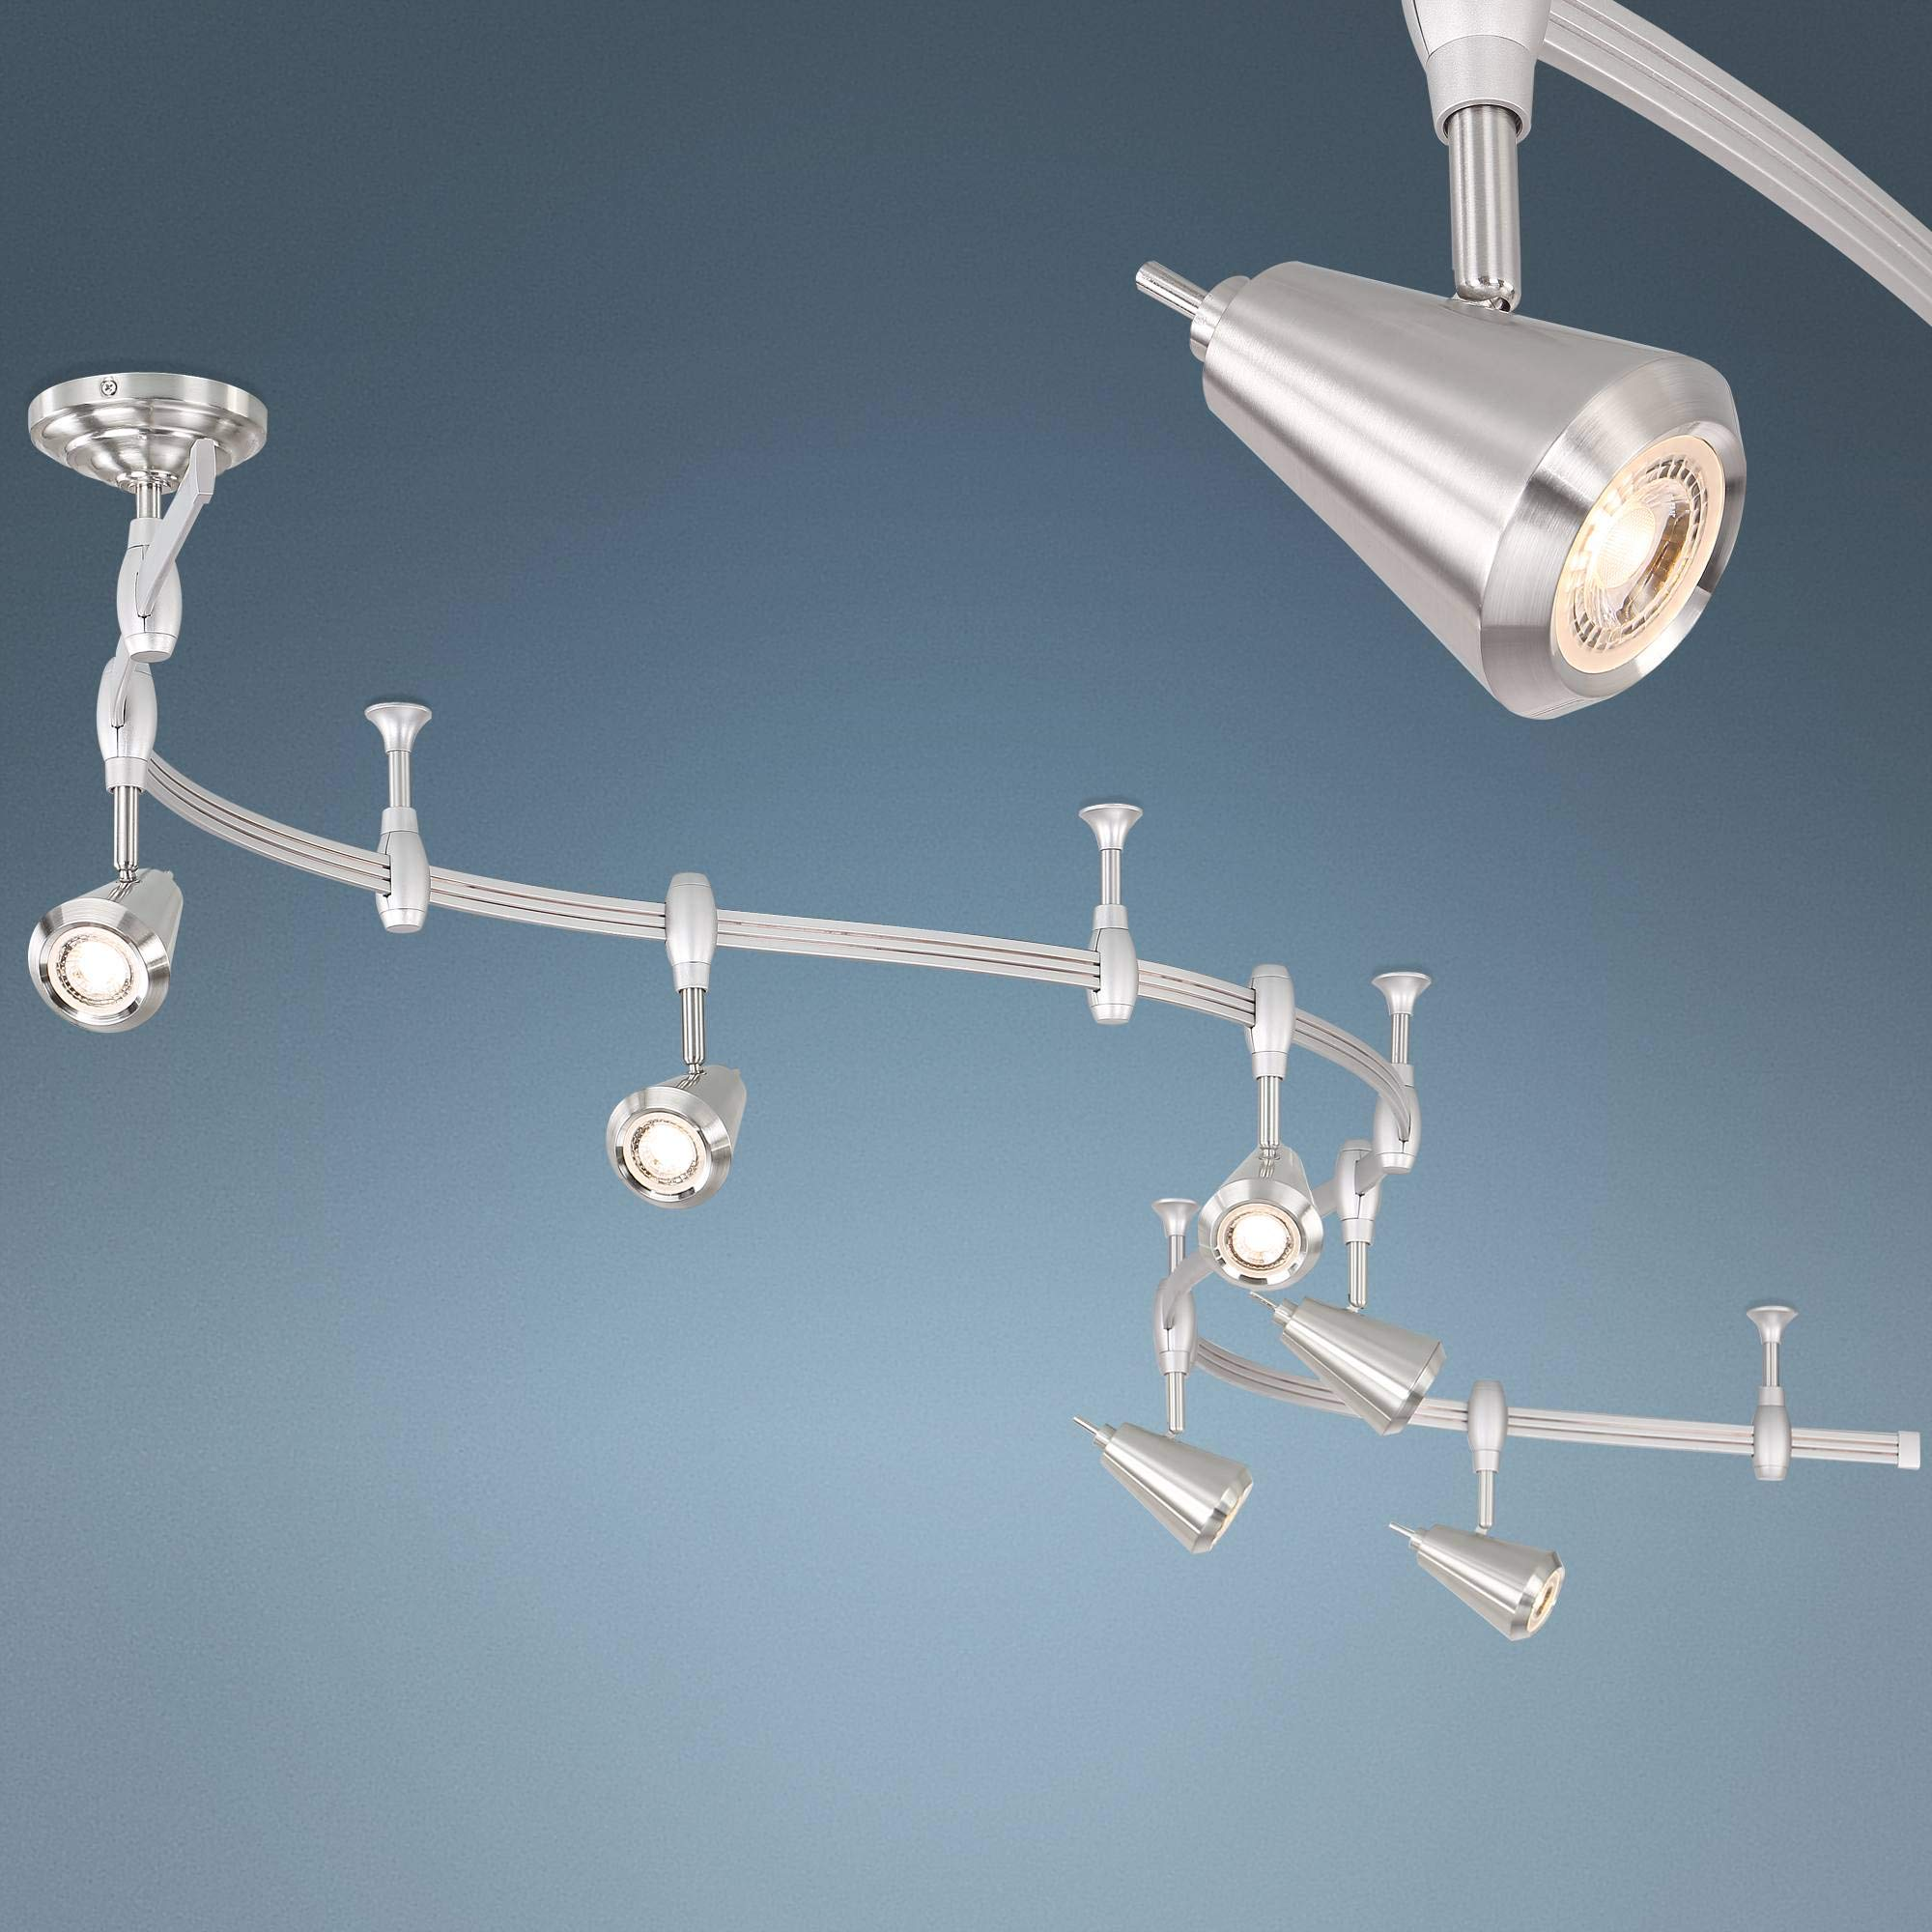 Ali 6-Light Brushed Nickel Monorail LED Track Light - Pro Track